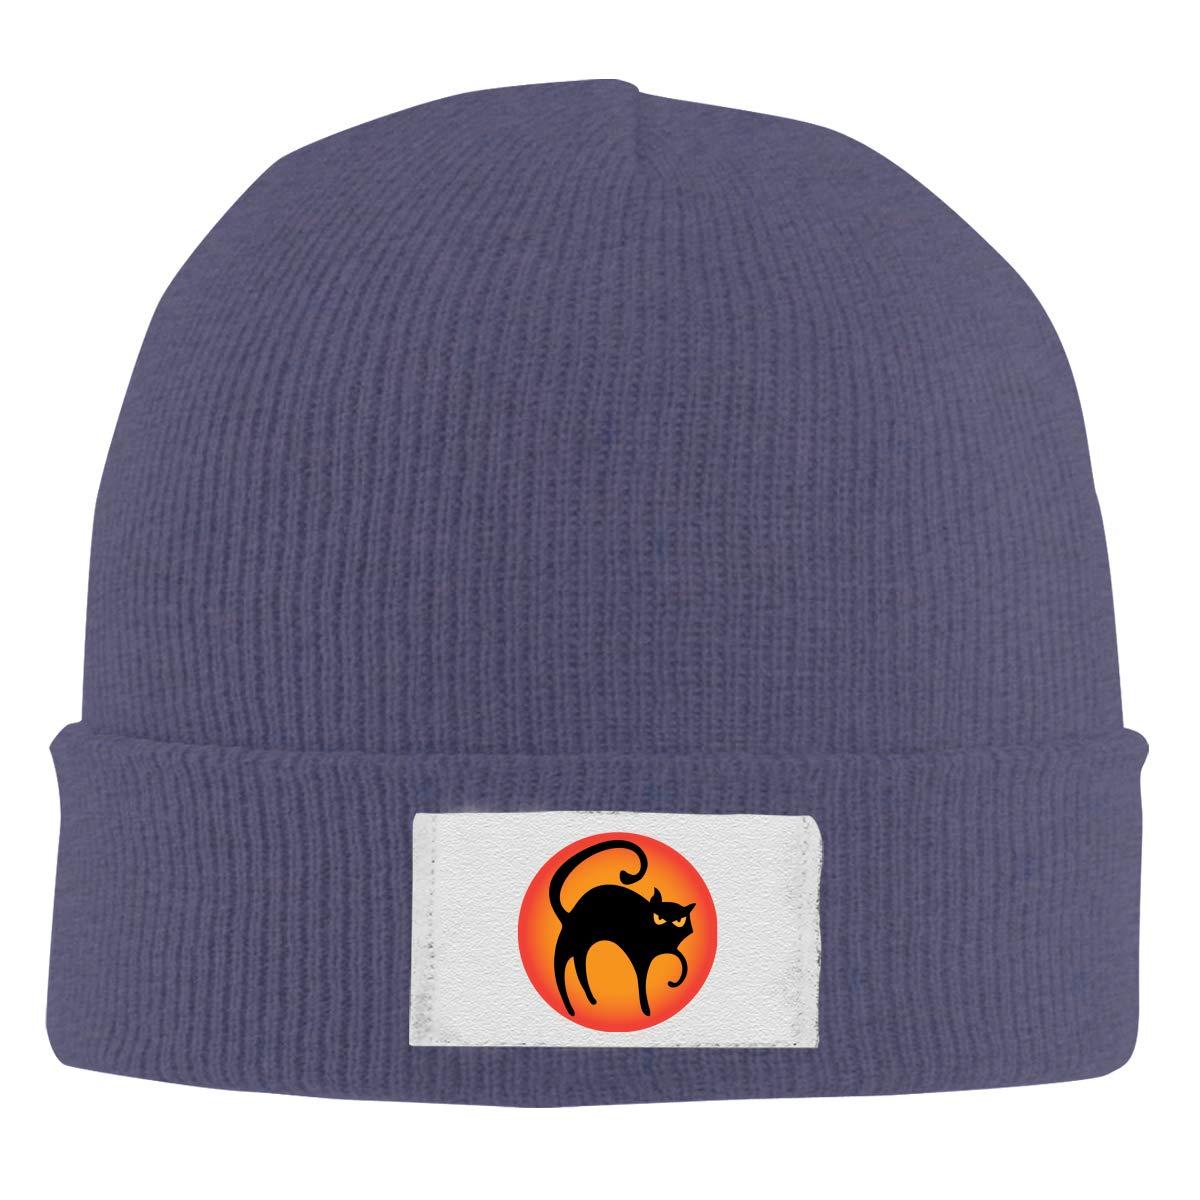 Black Cat Knitted Hat Winter Outdoor Hat Warm Beanie Caps for Men Women